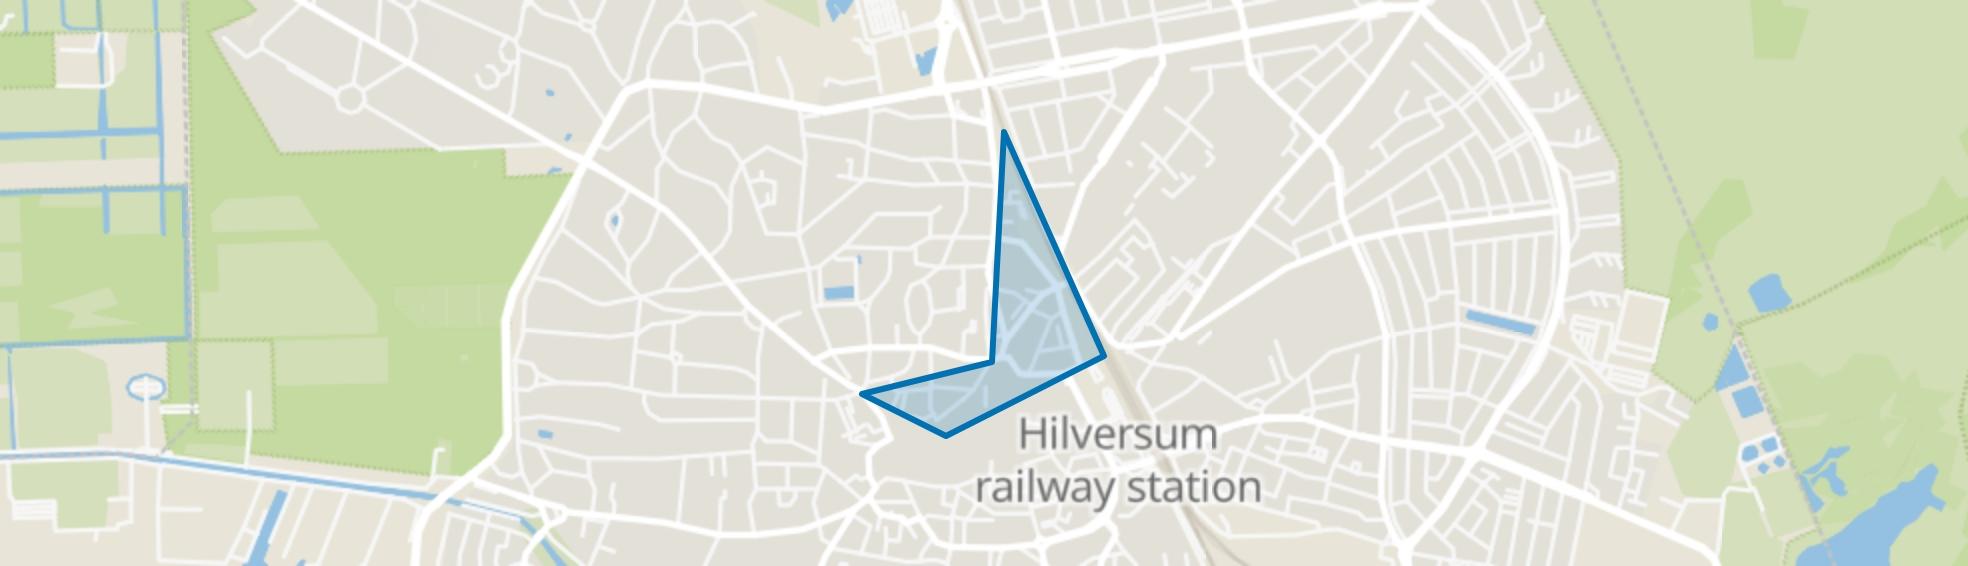 Langgewenstbuurt, Hilversum map